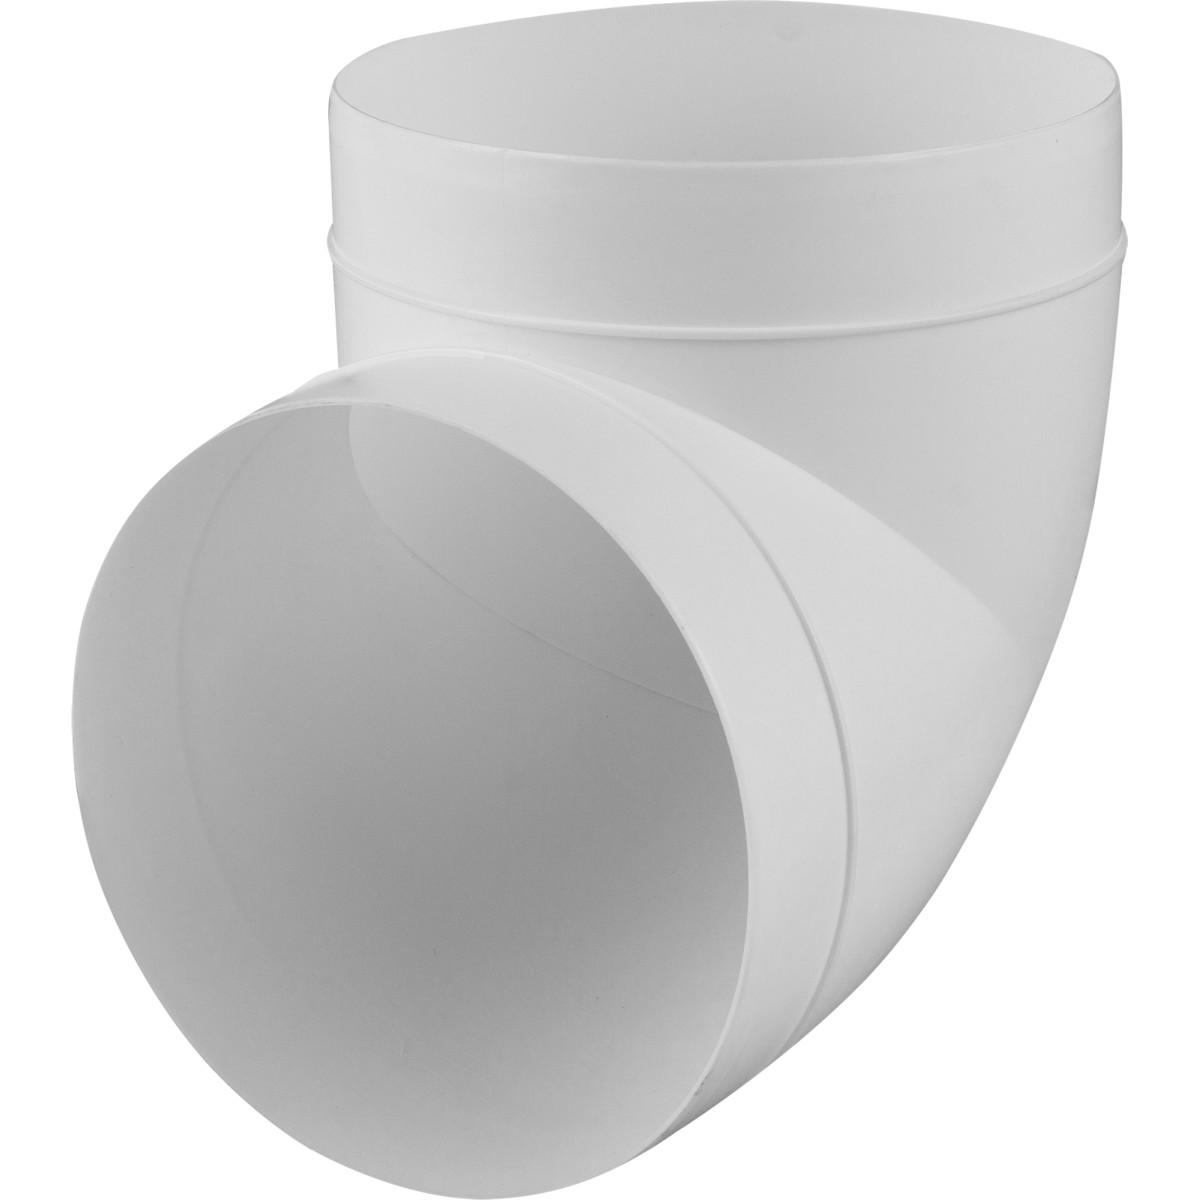 Колено круглое 90 градусов D150 мм